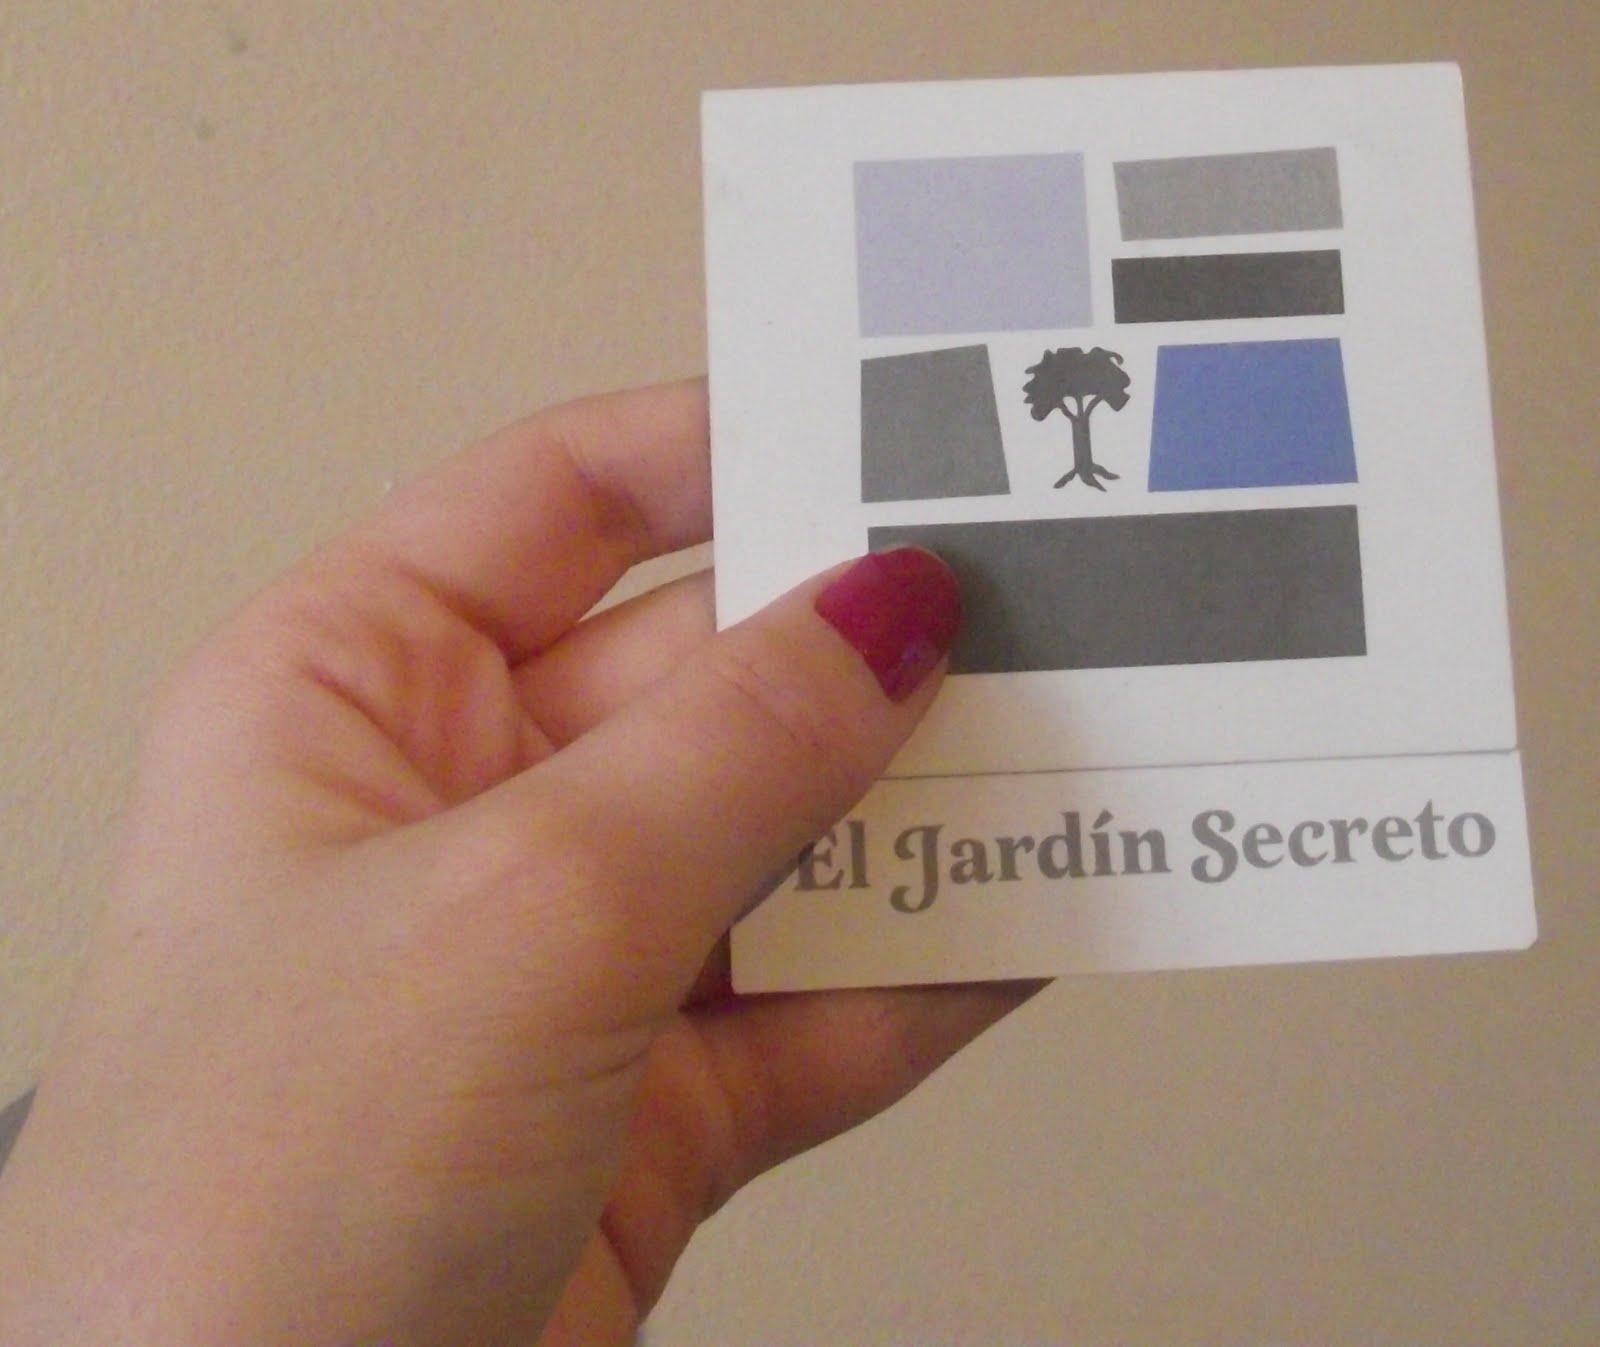 Caderninho ambulante el jard n secreto for El jardin secreto filmaffinity